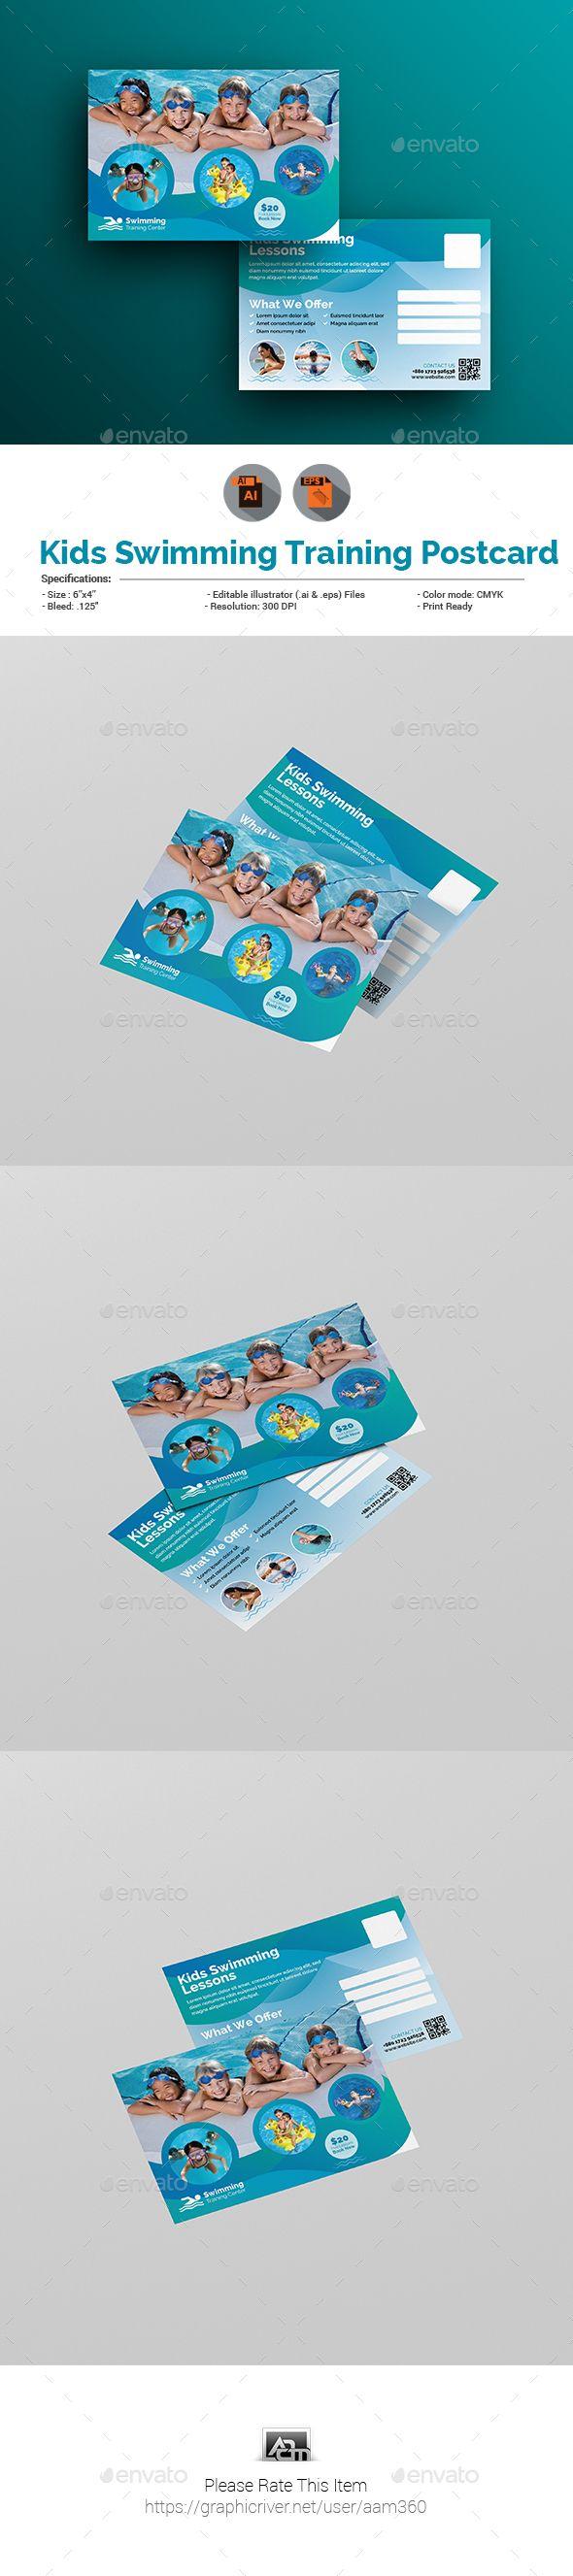 Kids Swimming Training Postcard Template Vector EPS, AI Illustrator